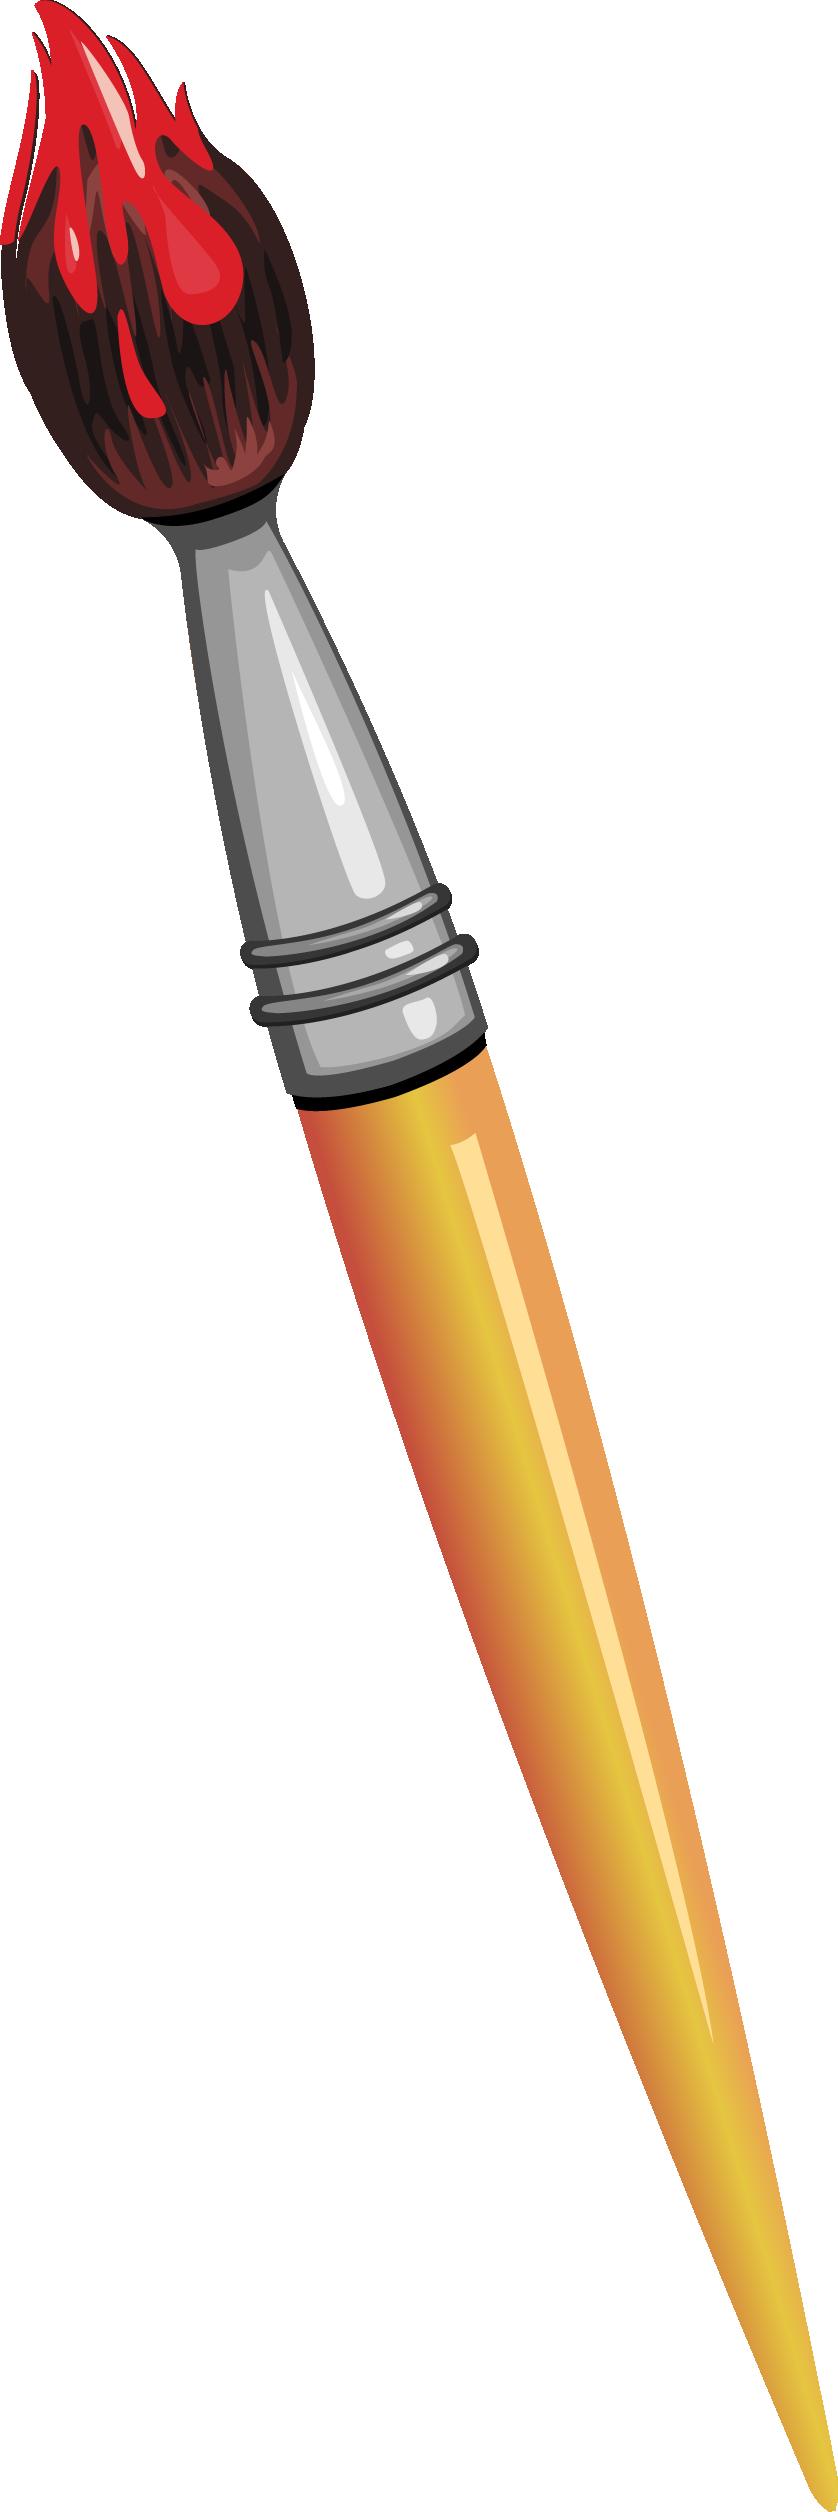 Рисунок кисточки для фотошопа